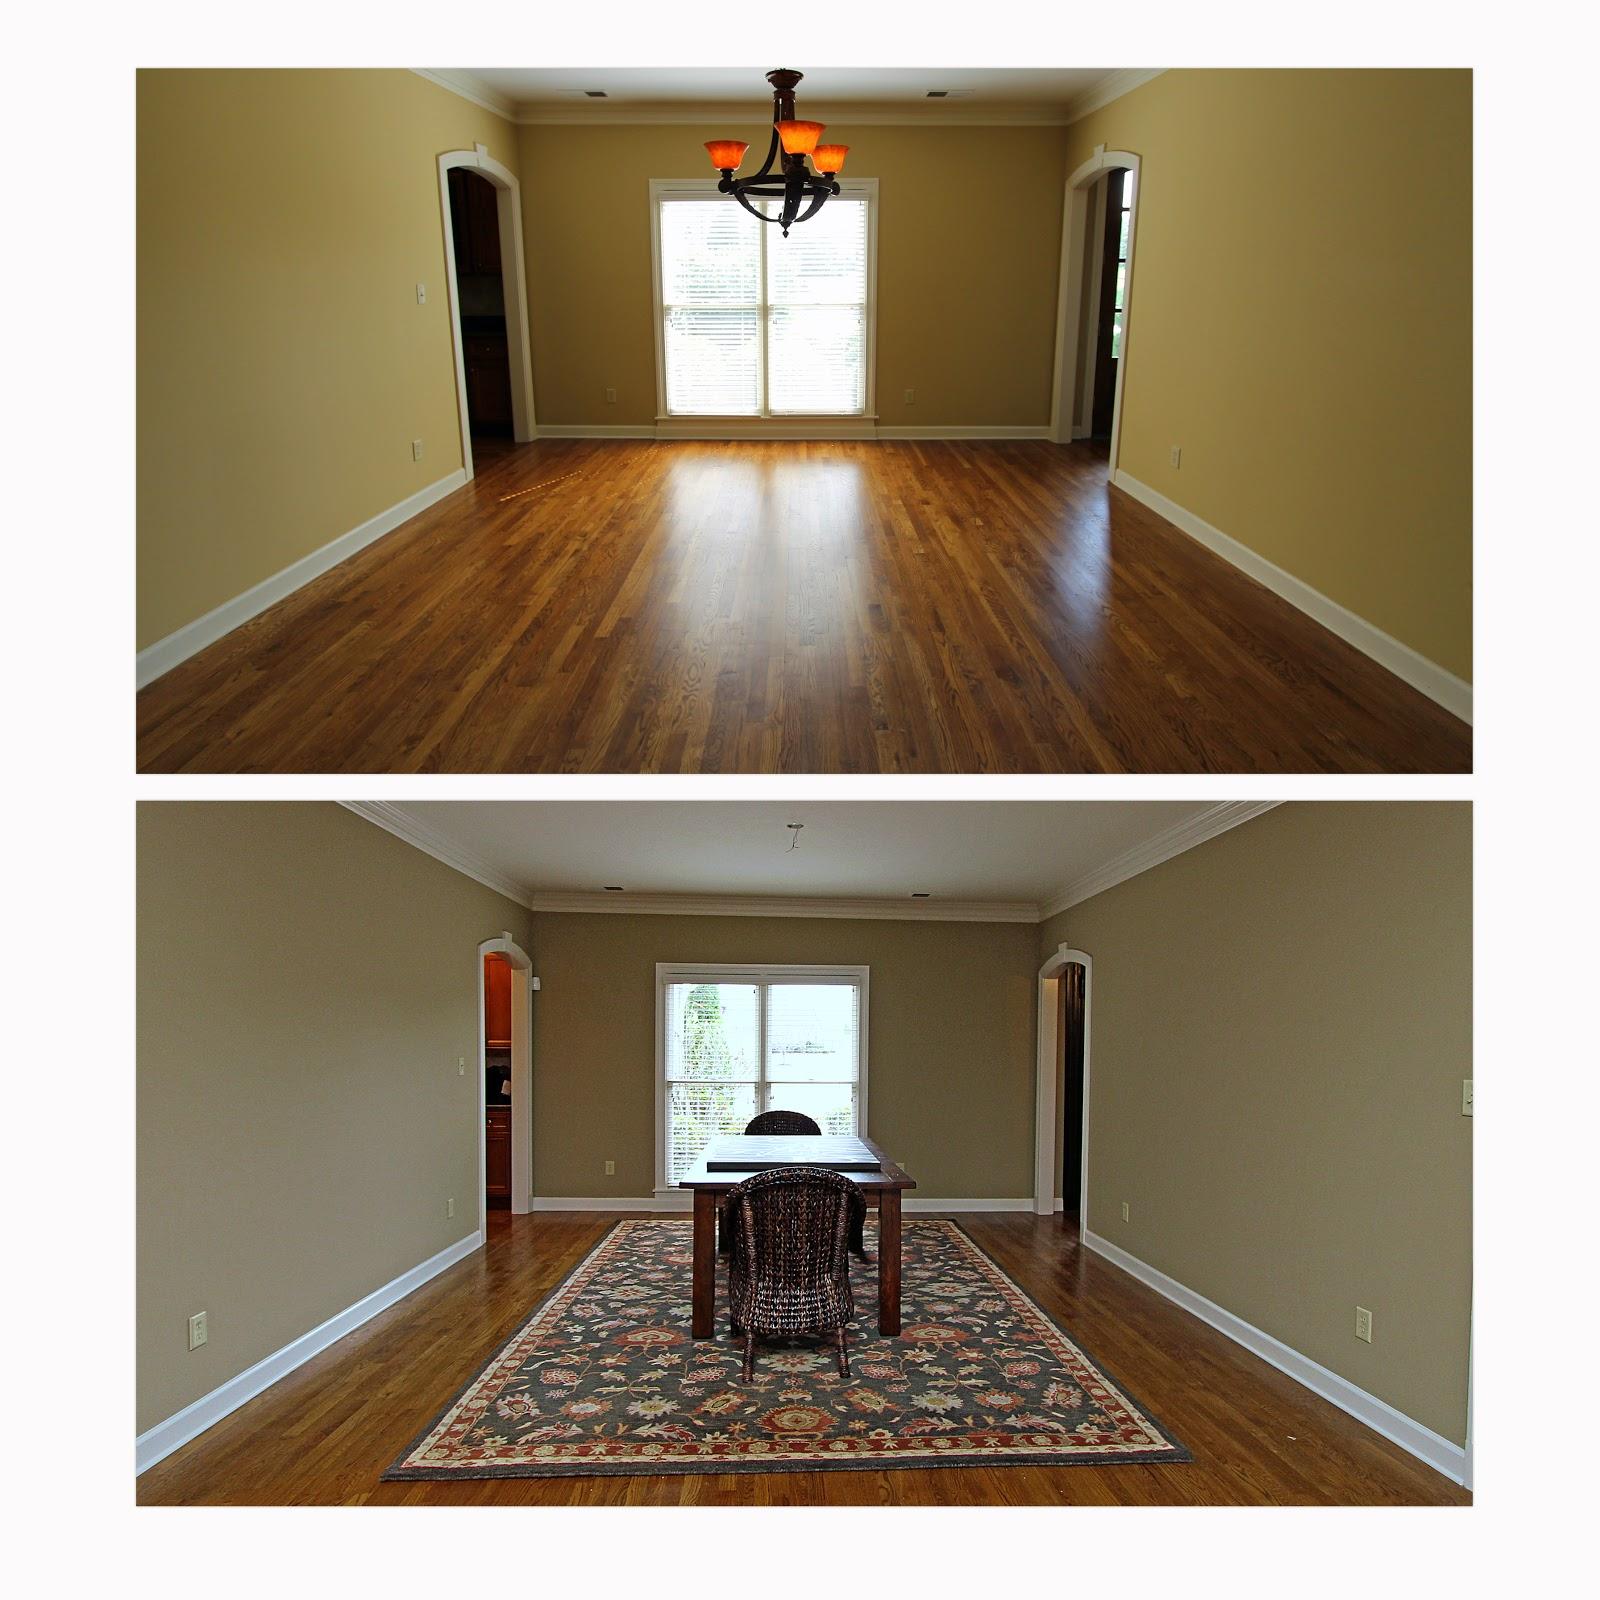 Furniture Factory Outlet - Furniture, Living Room , Dining Room